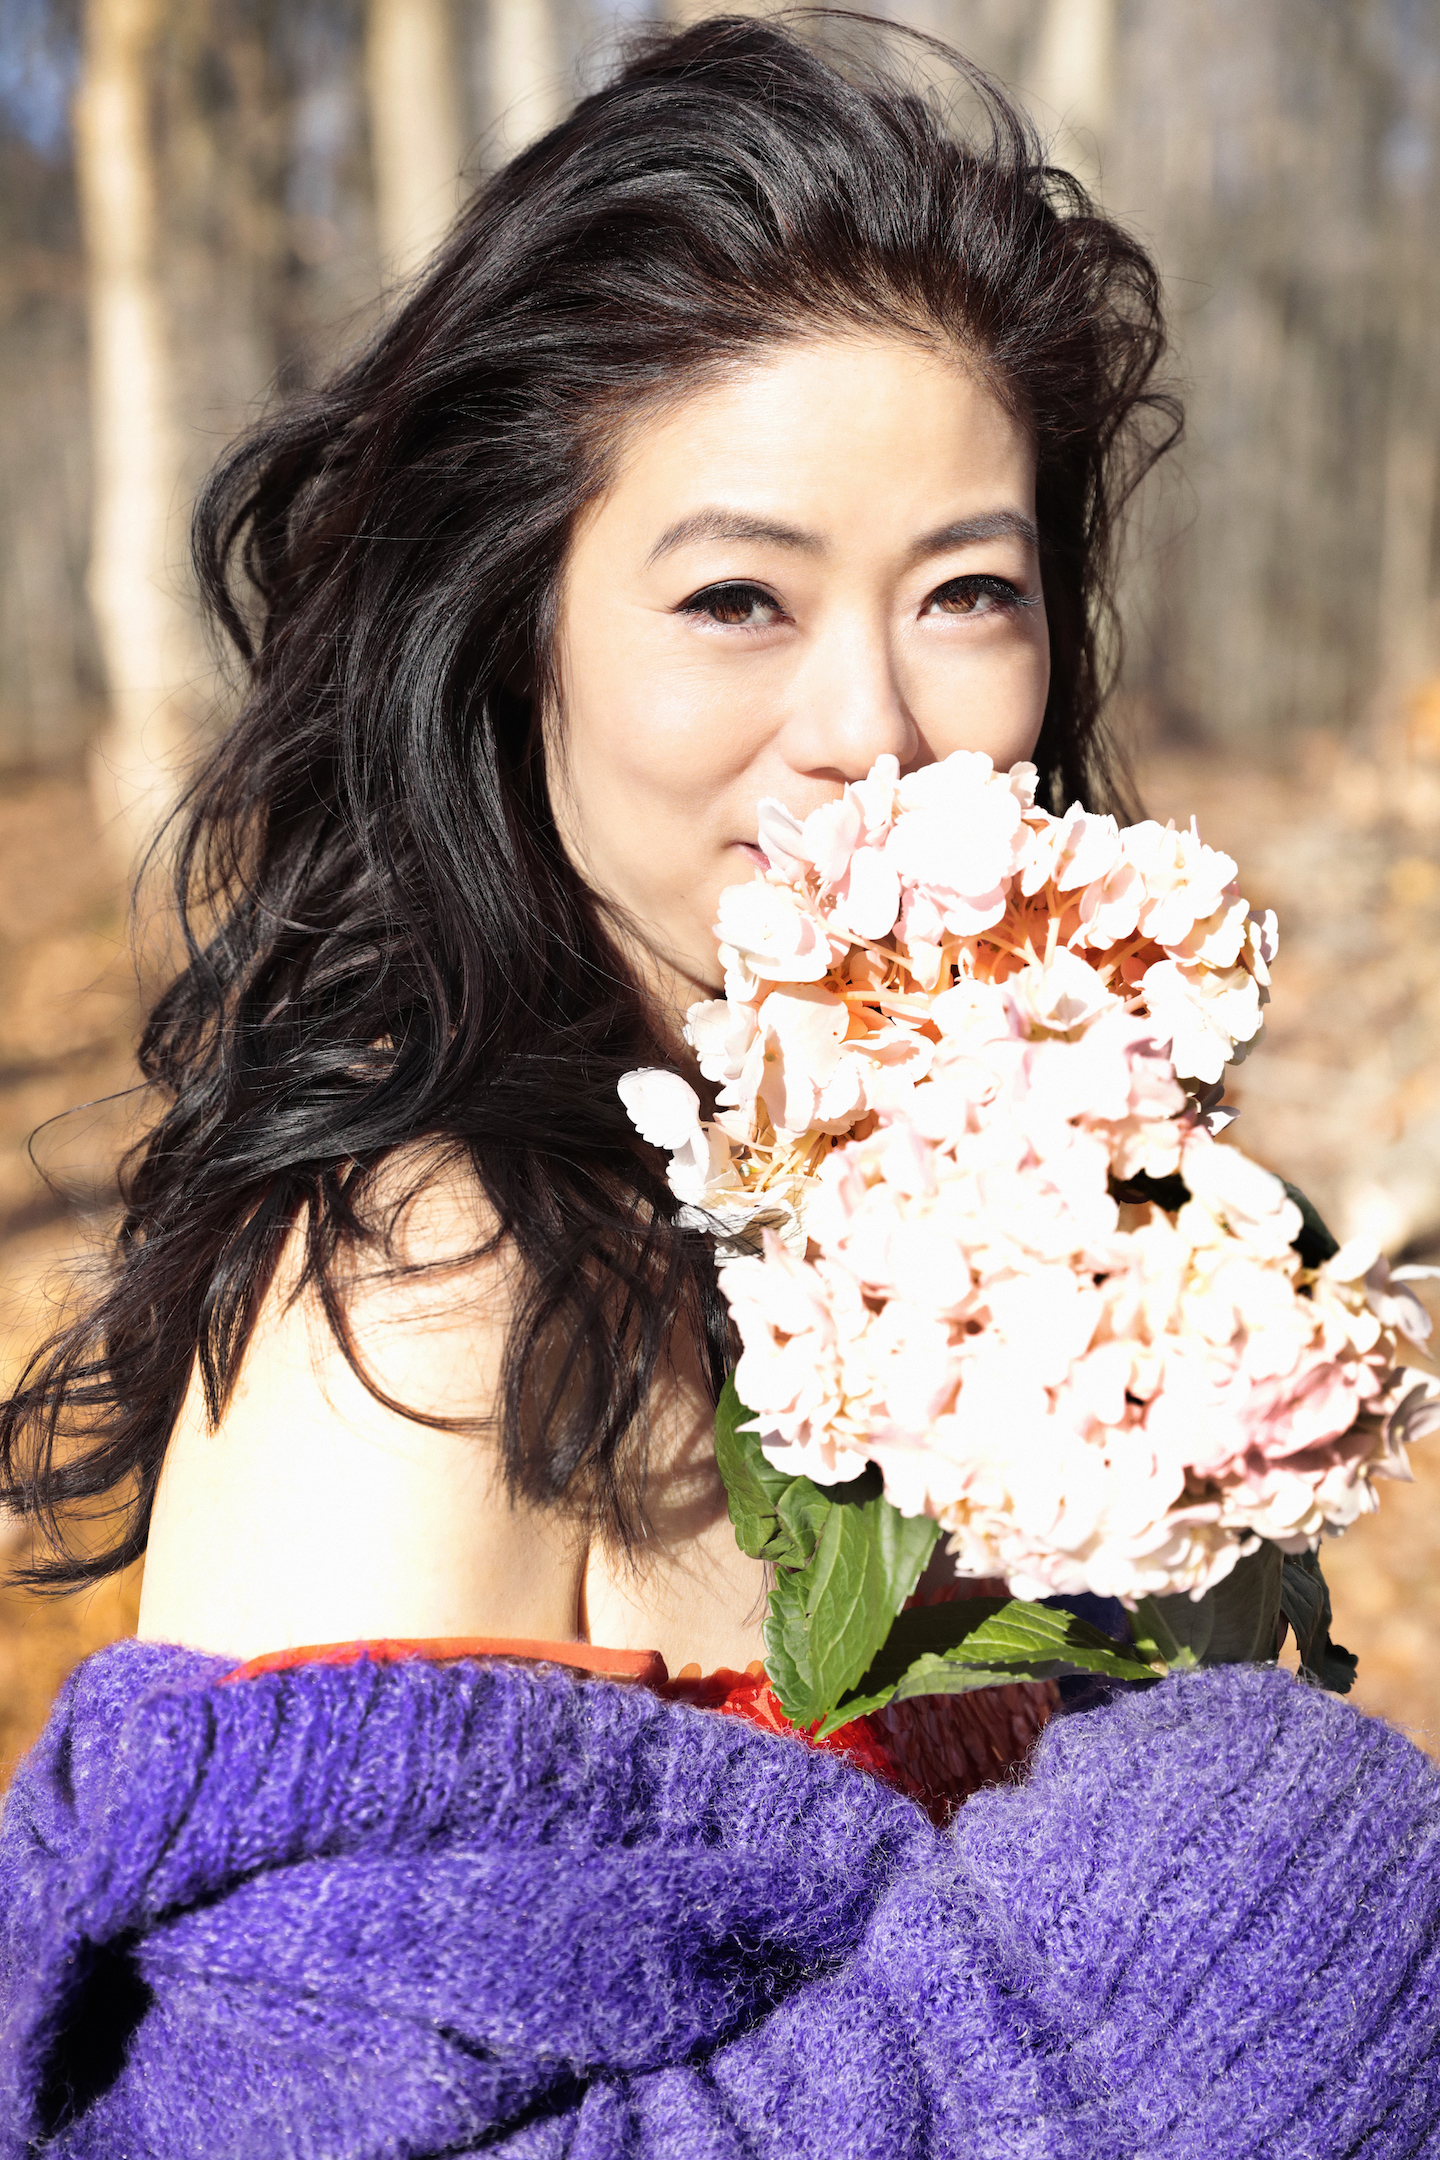 AJK_Flower_low-res.jpeg